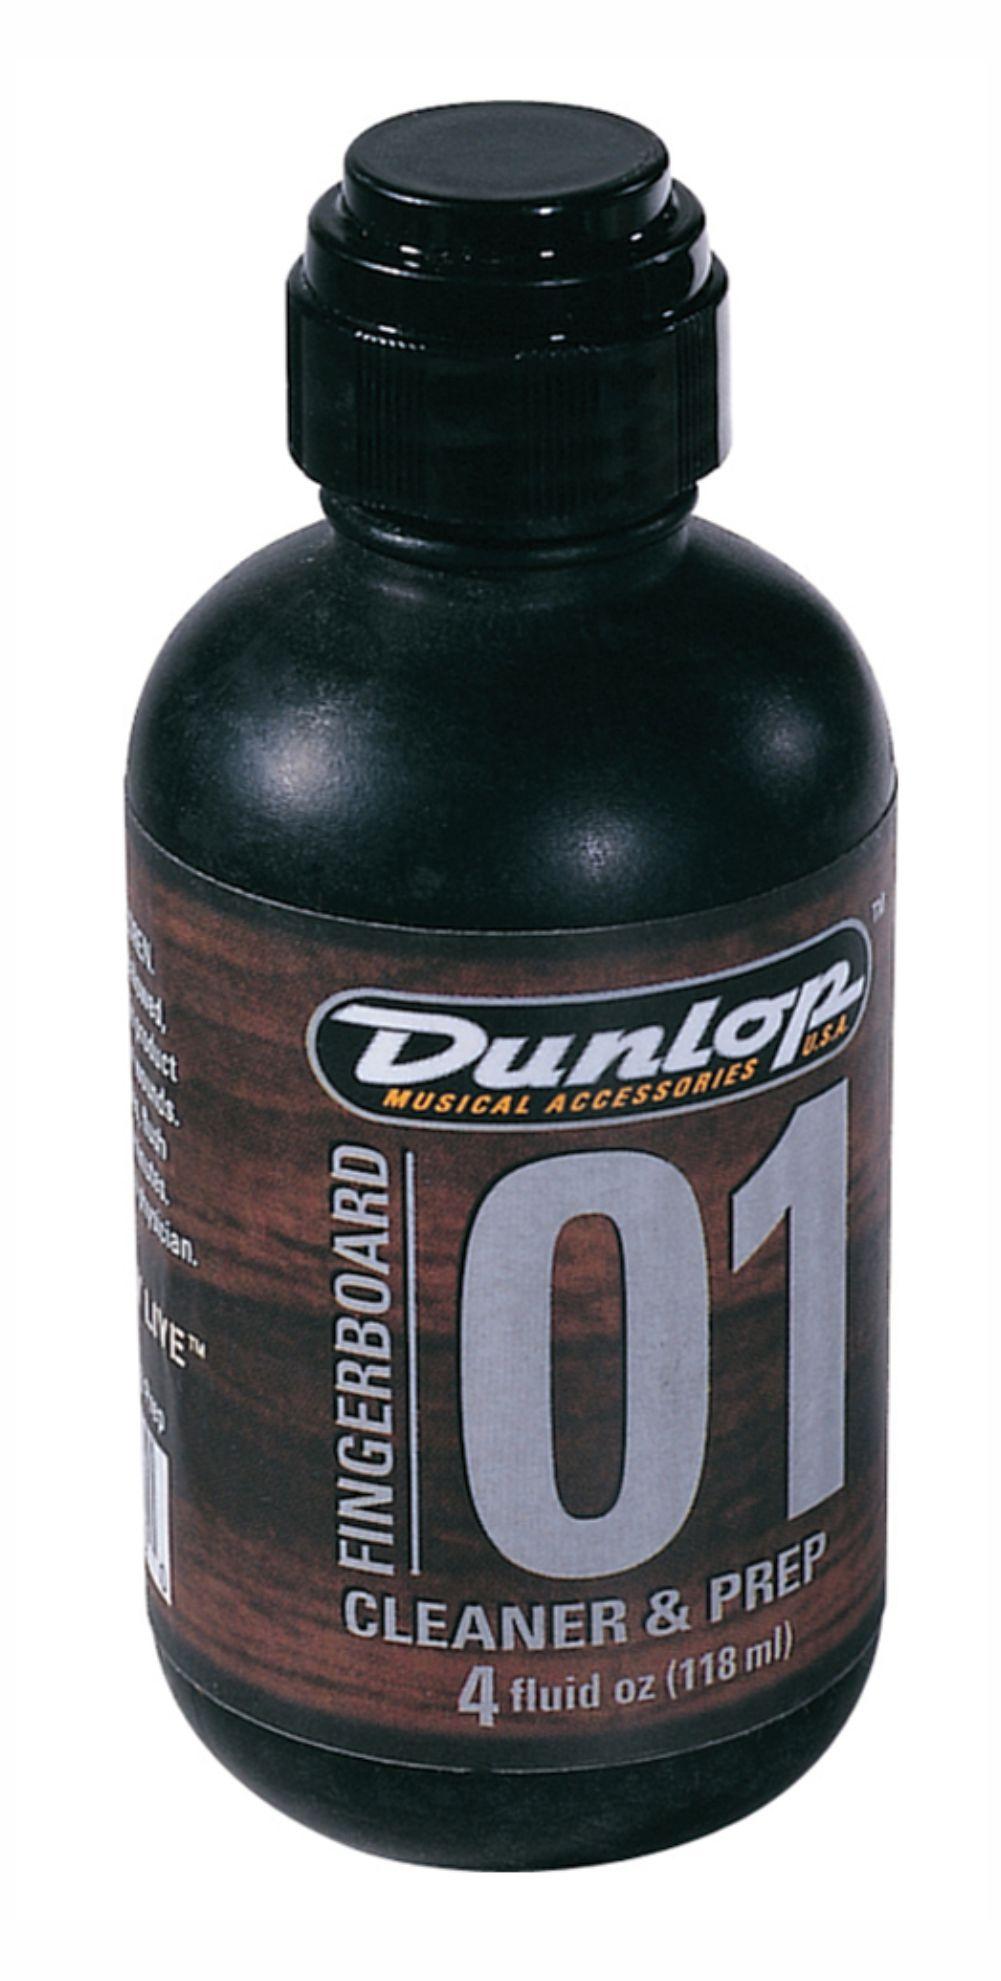 Limpador 01 de escala Jim Dunlop